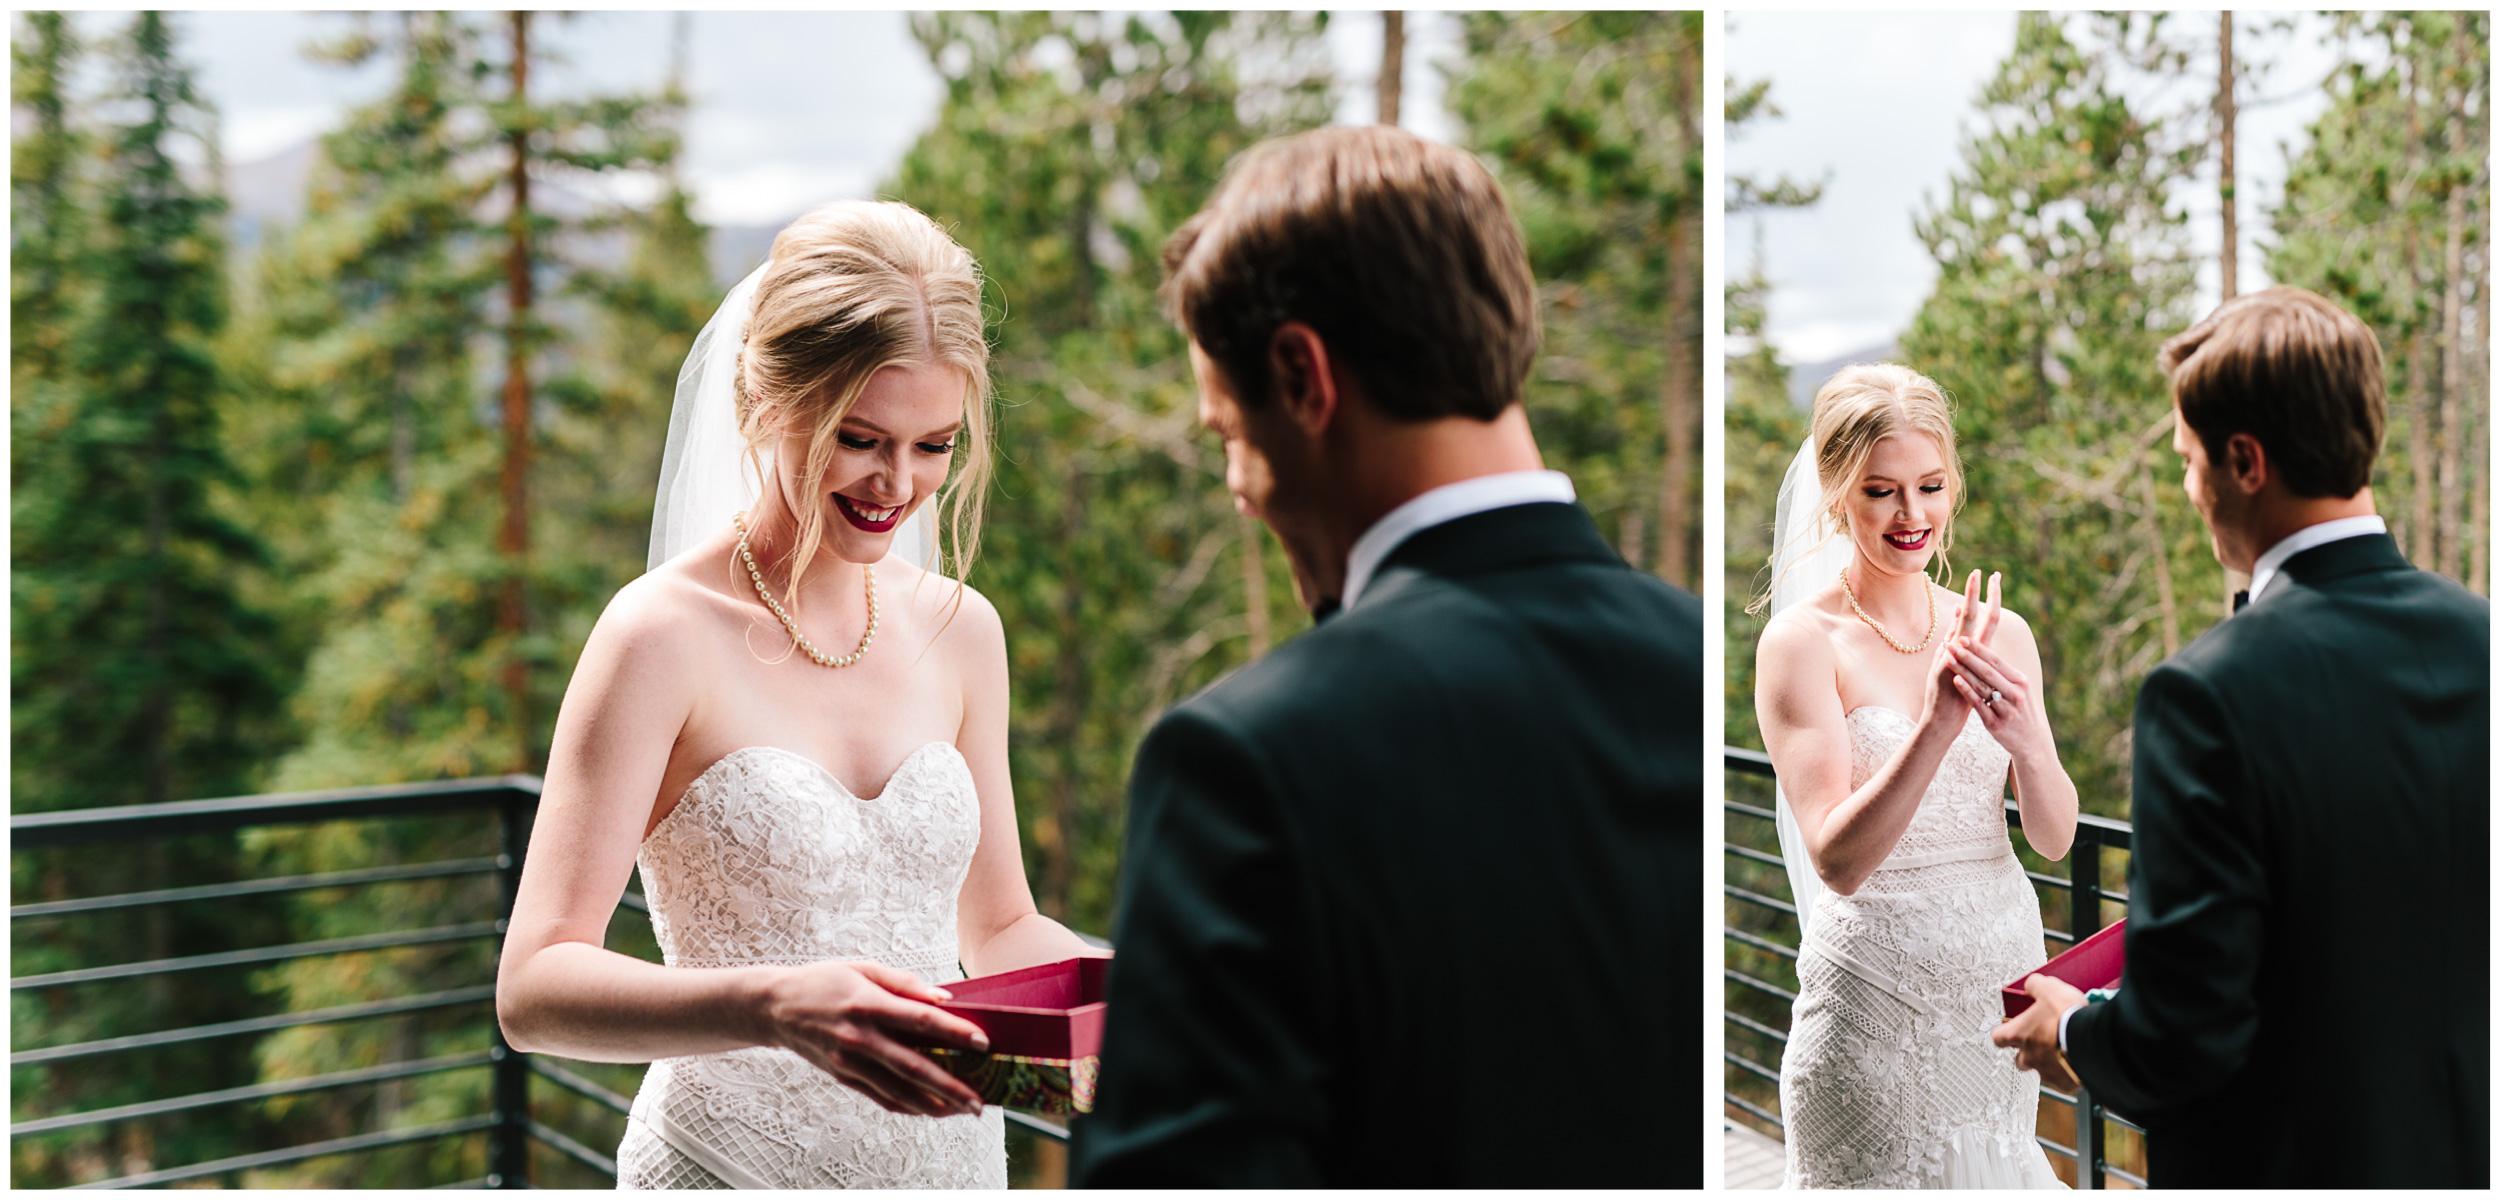 ten_mile_station_wedding_28.jpg